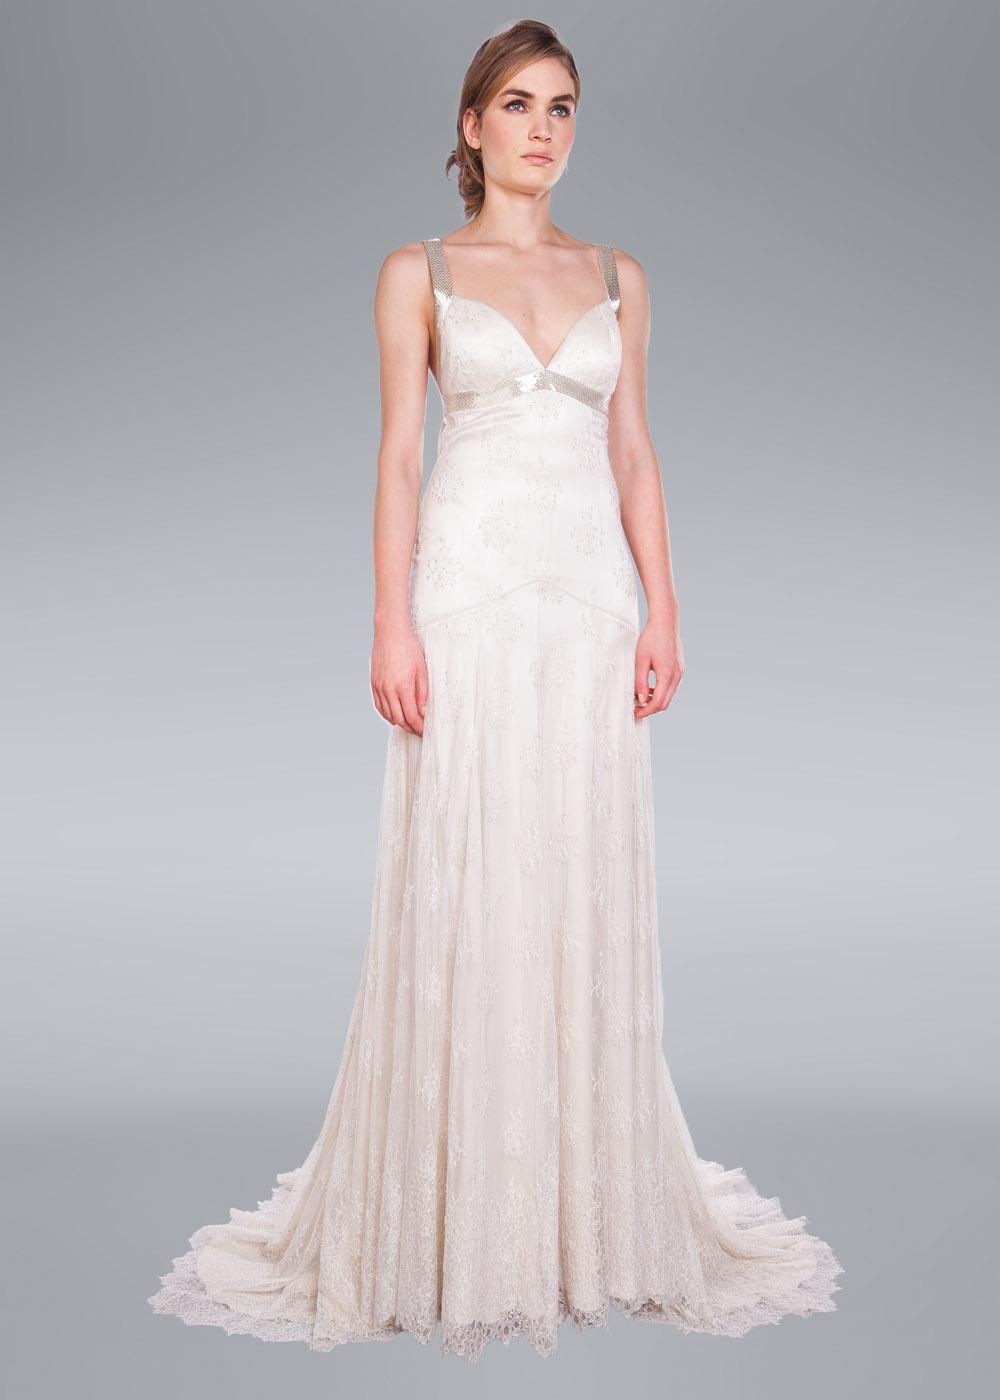 Arabella Wedding Dress, Amanda Wakeley Designer Collection